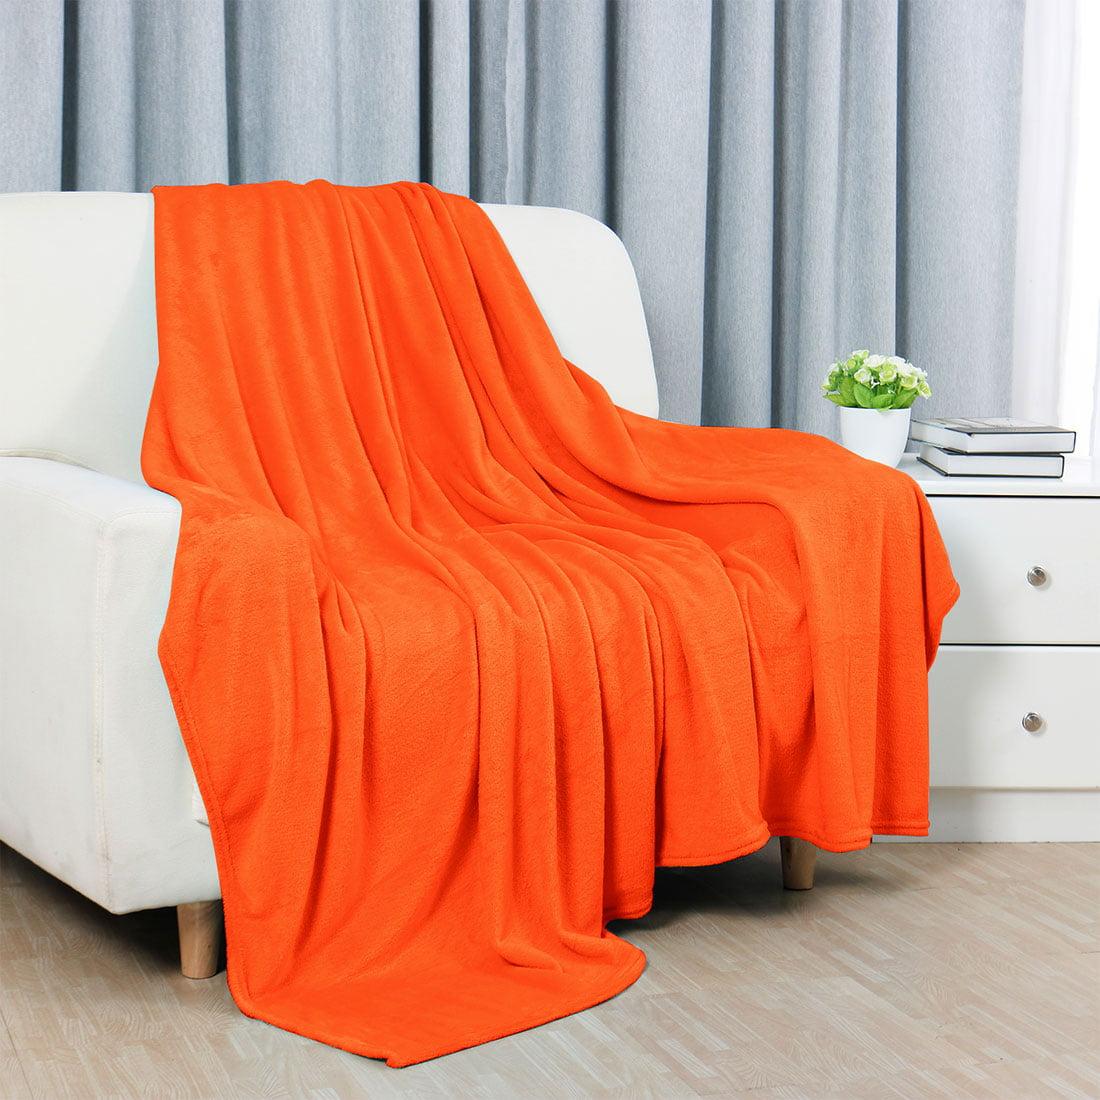 Unique BargainsTwin Bedding Sofa Soft Fleece Throws Blanket Orange 59 x78 Inch